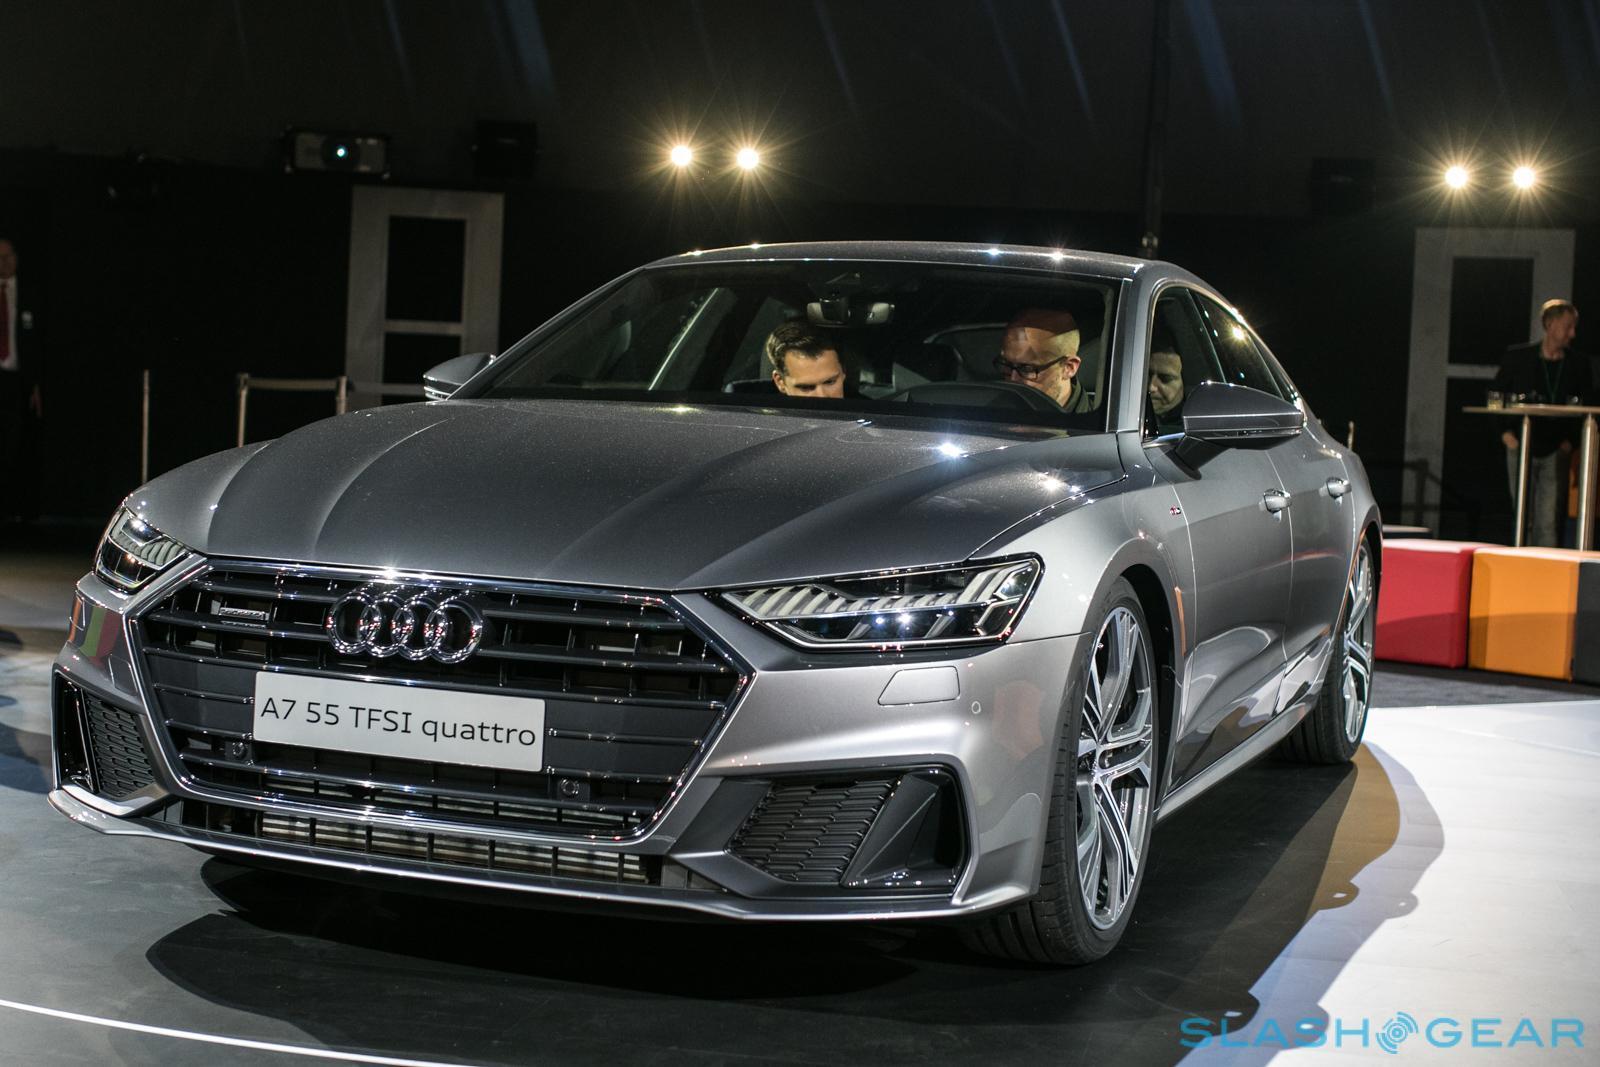 Kelebihan Kekurangan A7 2019 Audi Murah Berkualitas